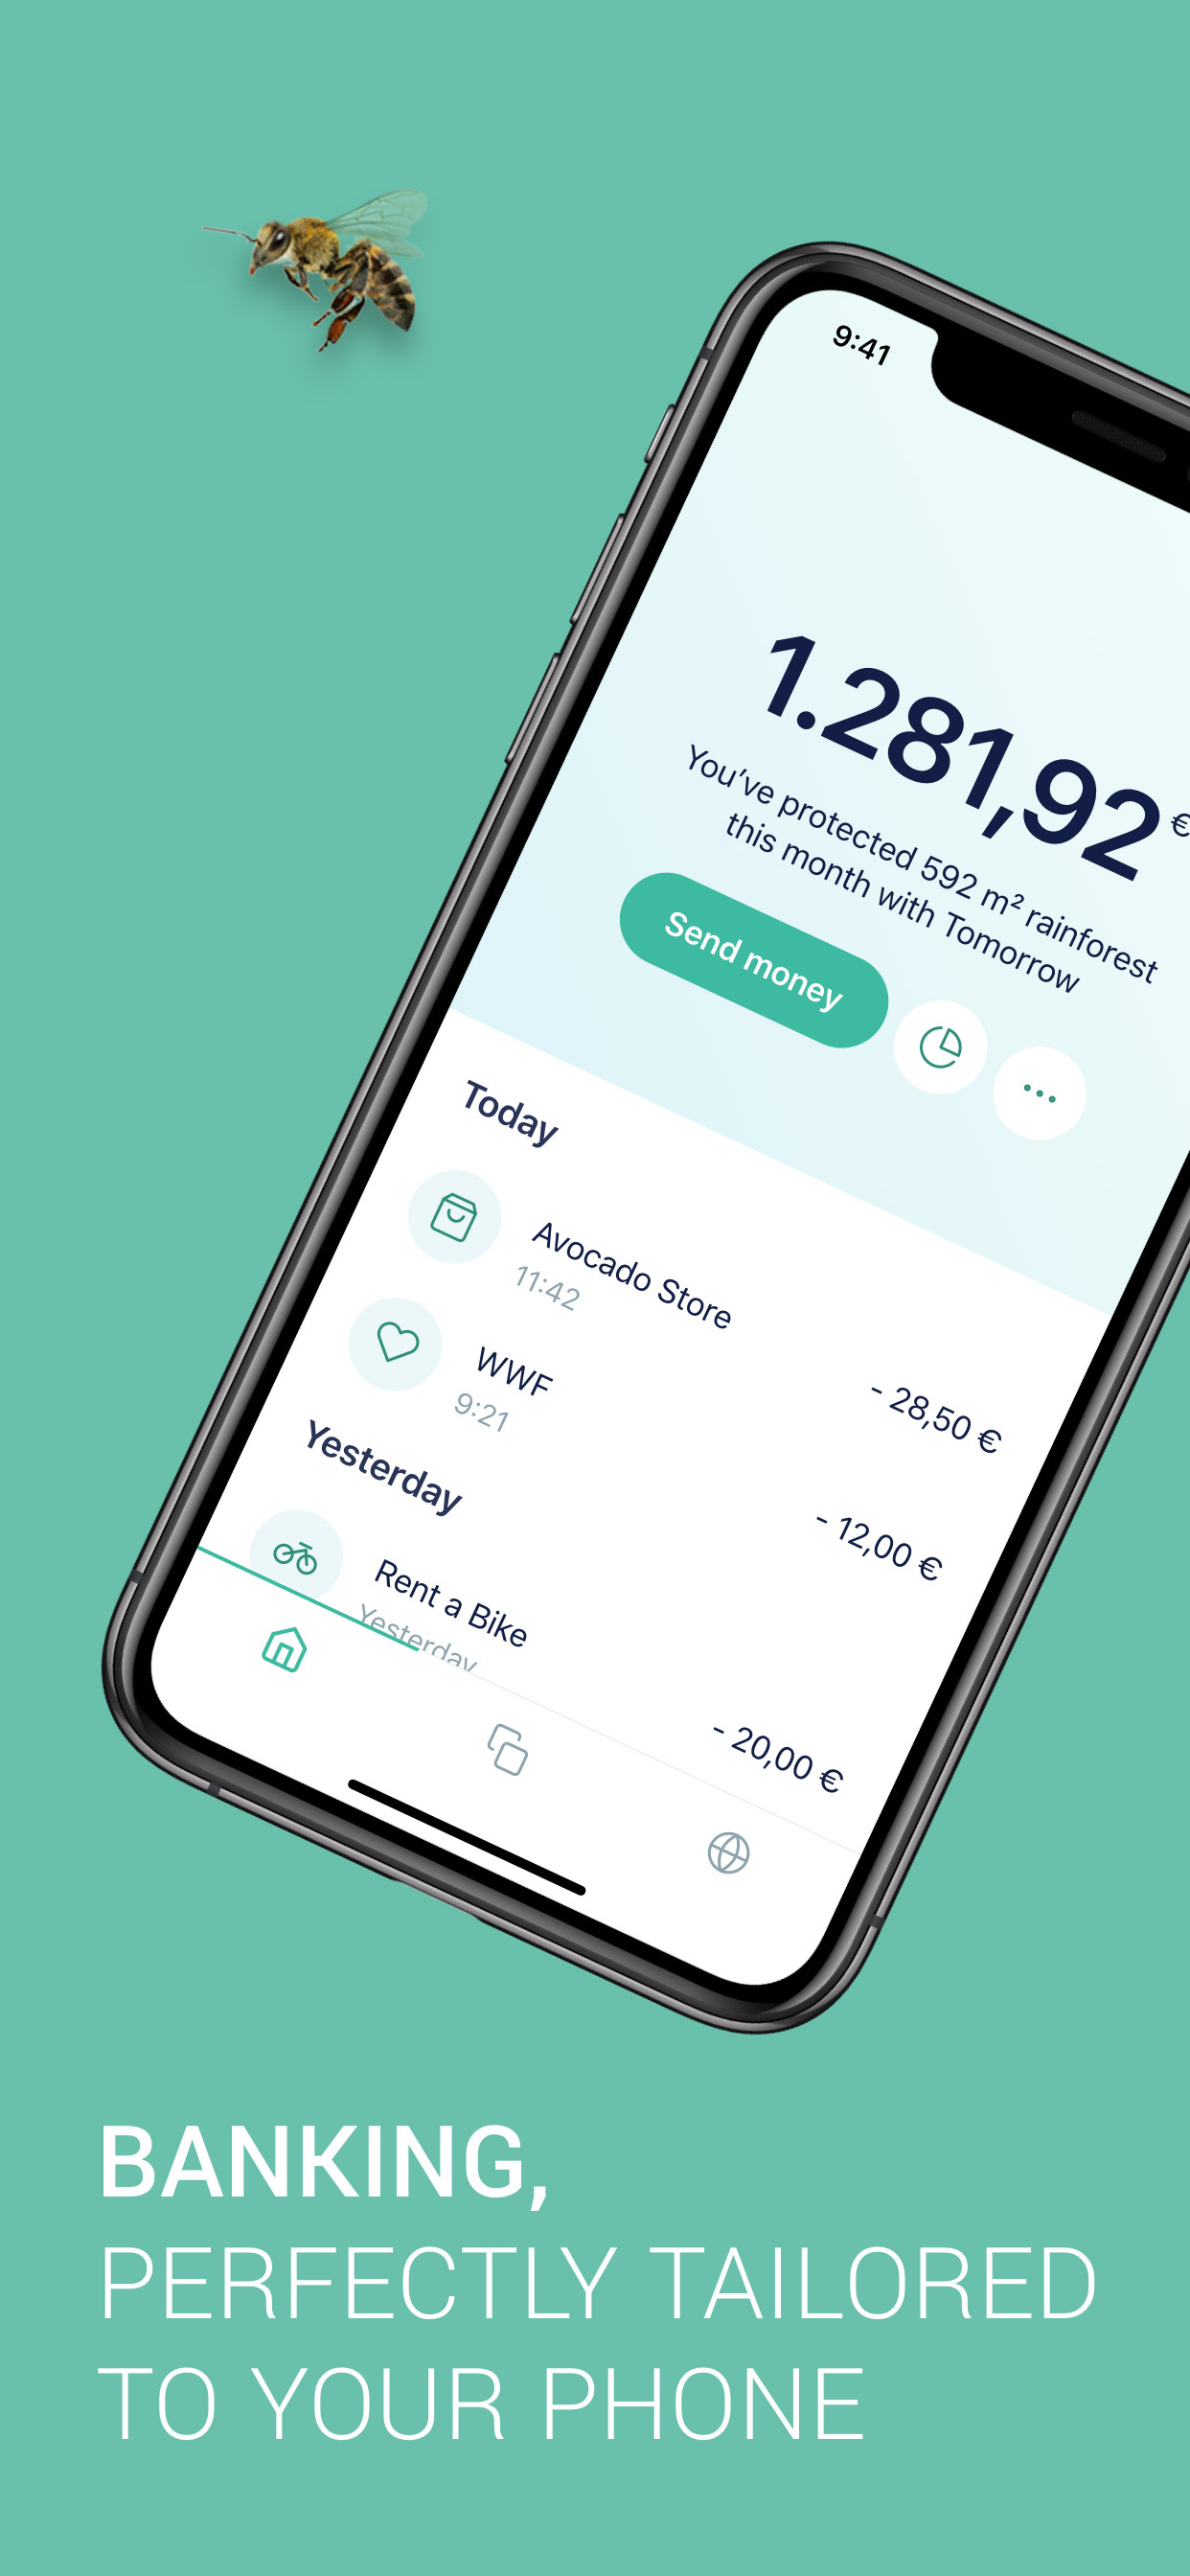 Smartphonebank Tomorrow sammelt Geld fast neun Millionen Euro ein